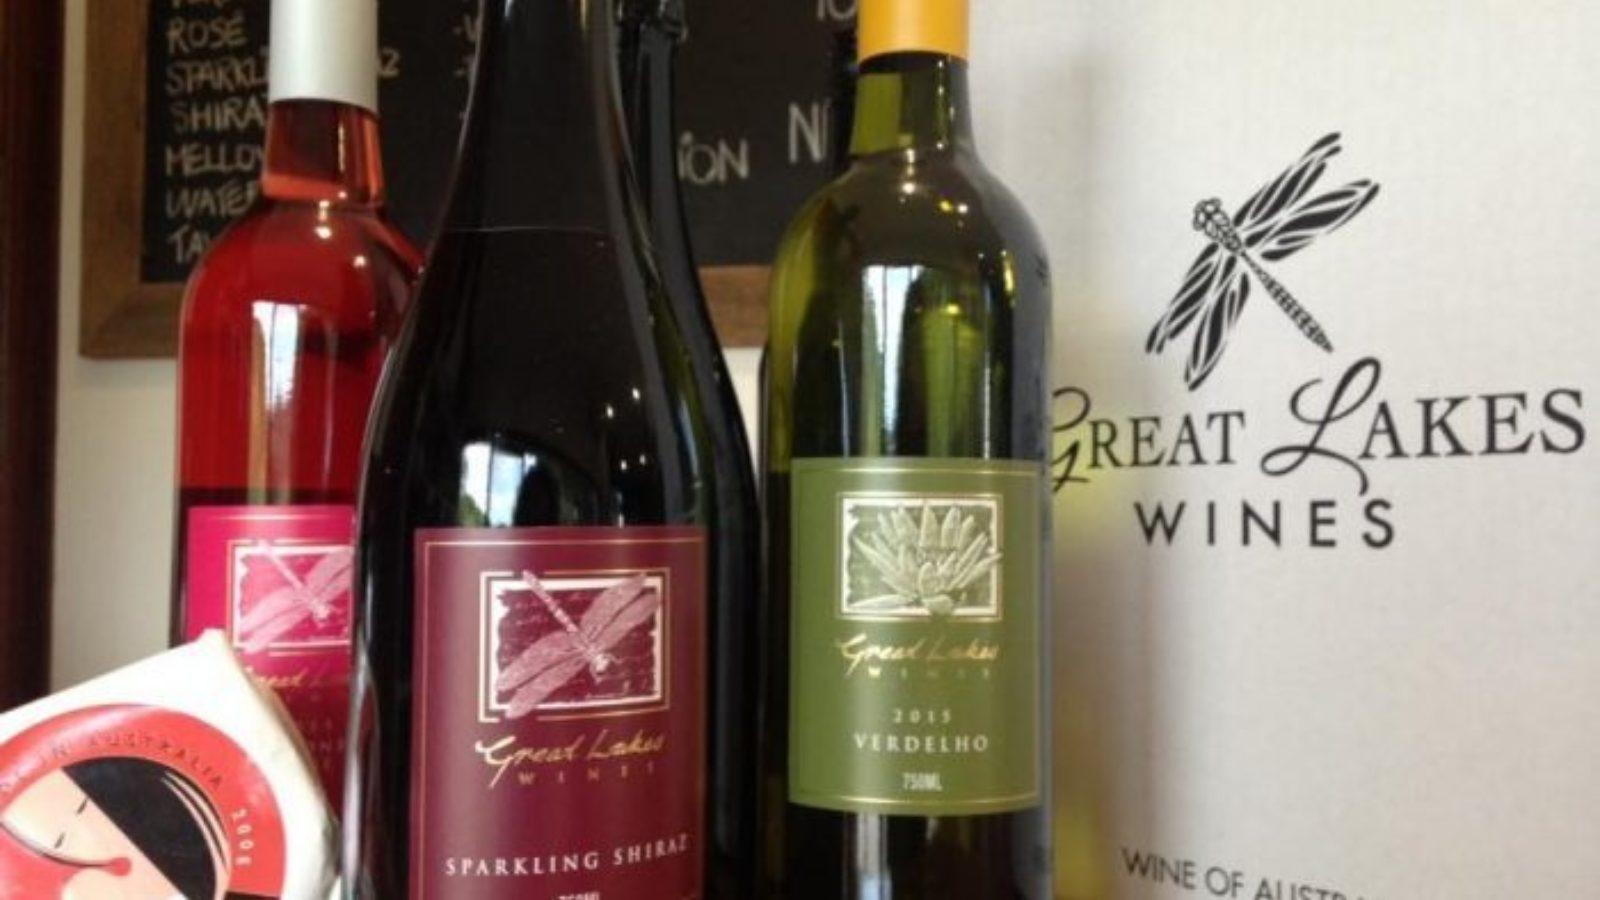 Great Lakes Paddocks wines